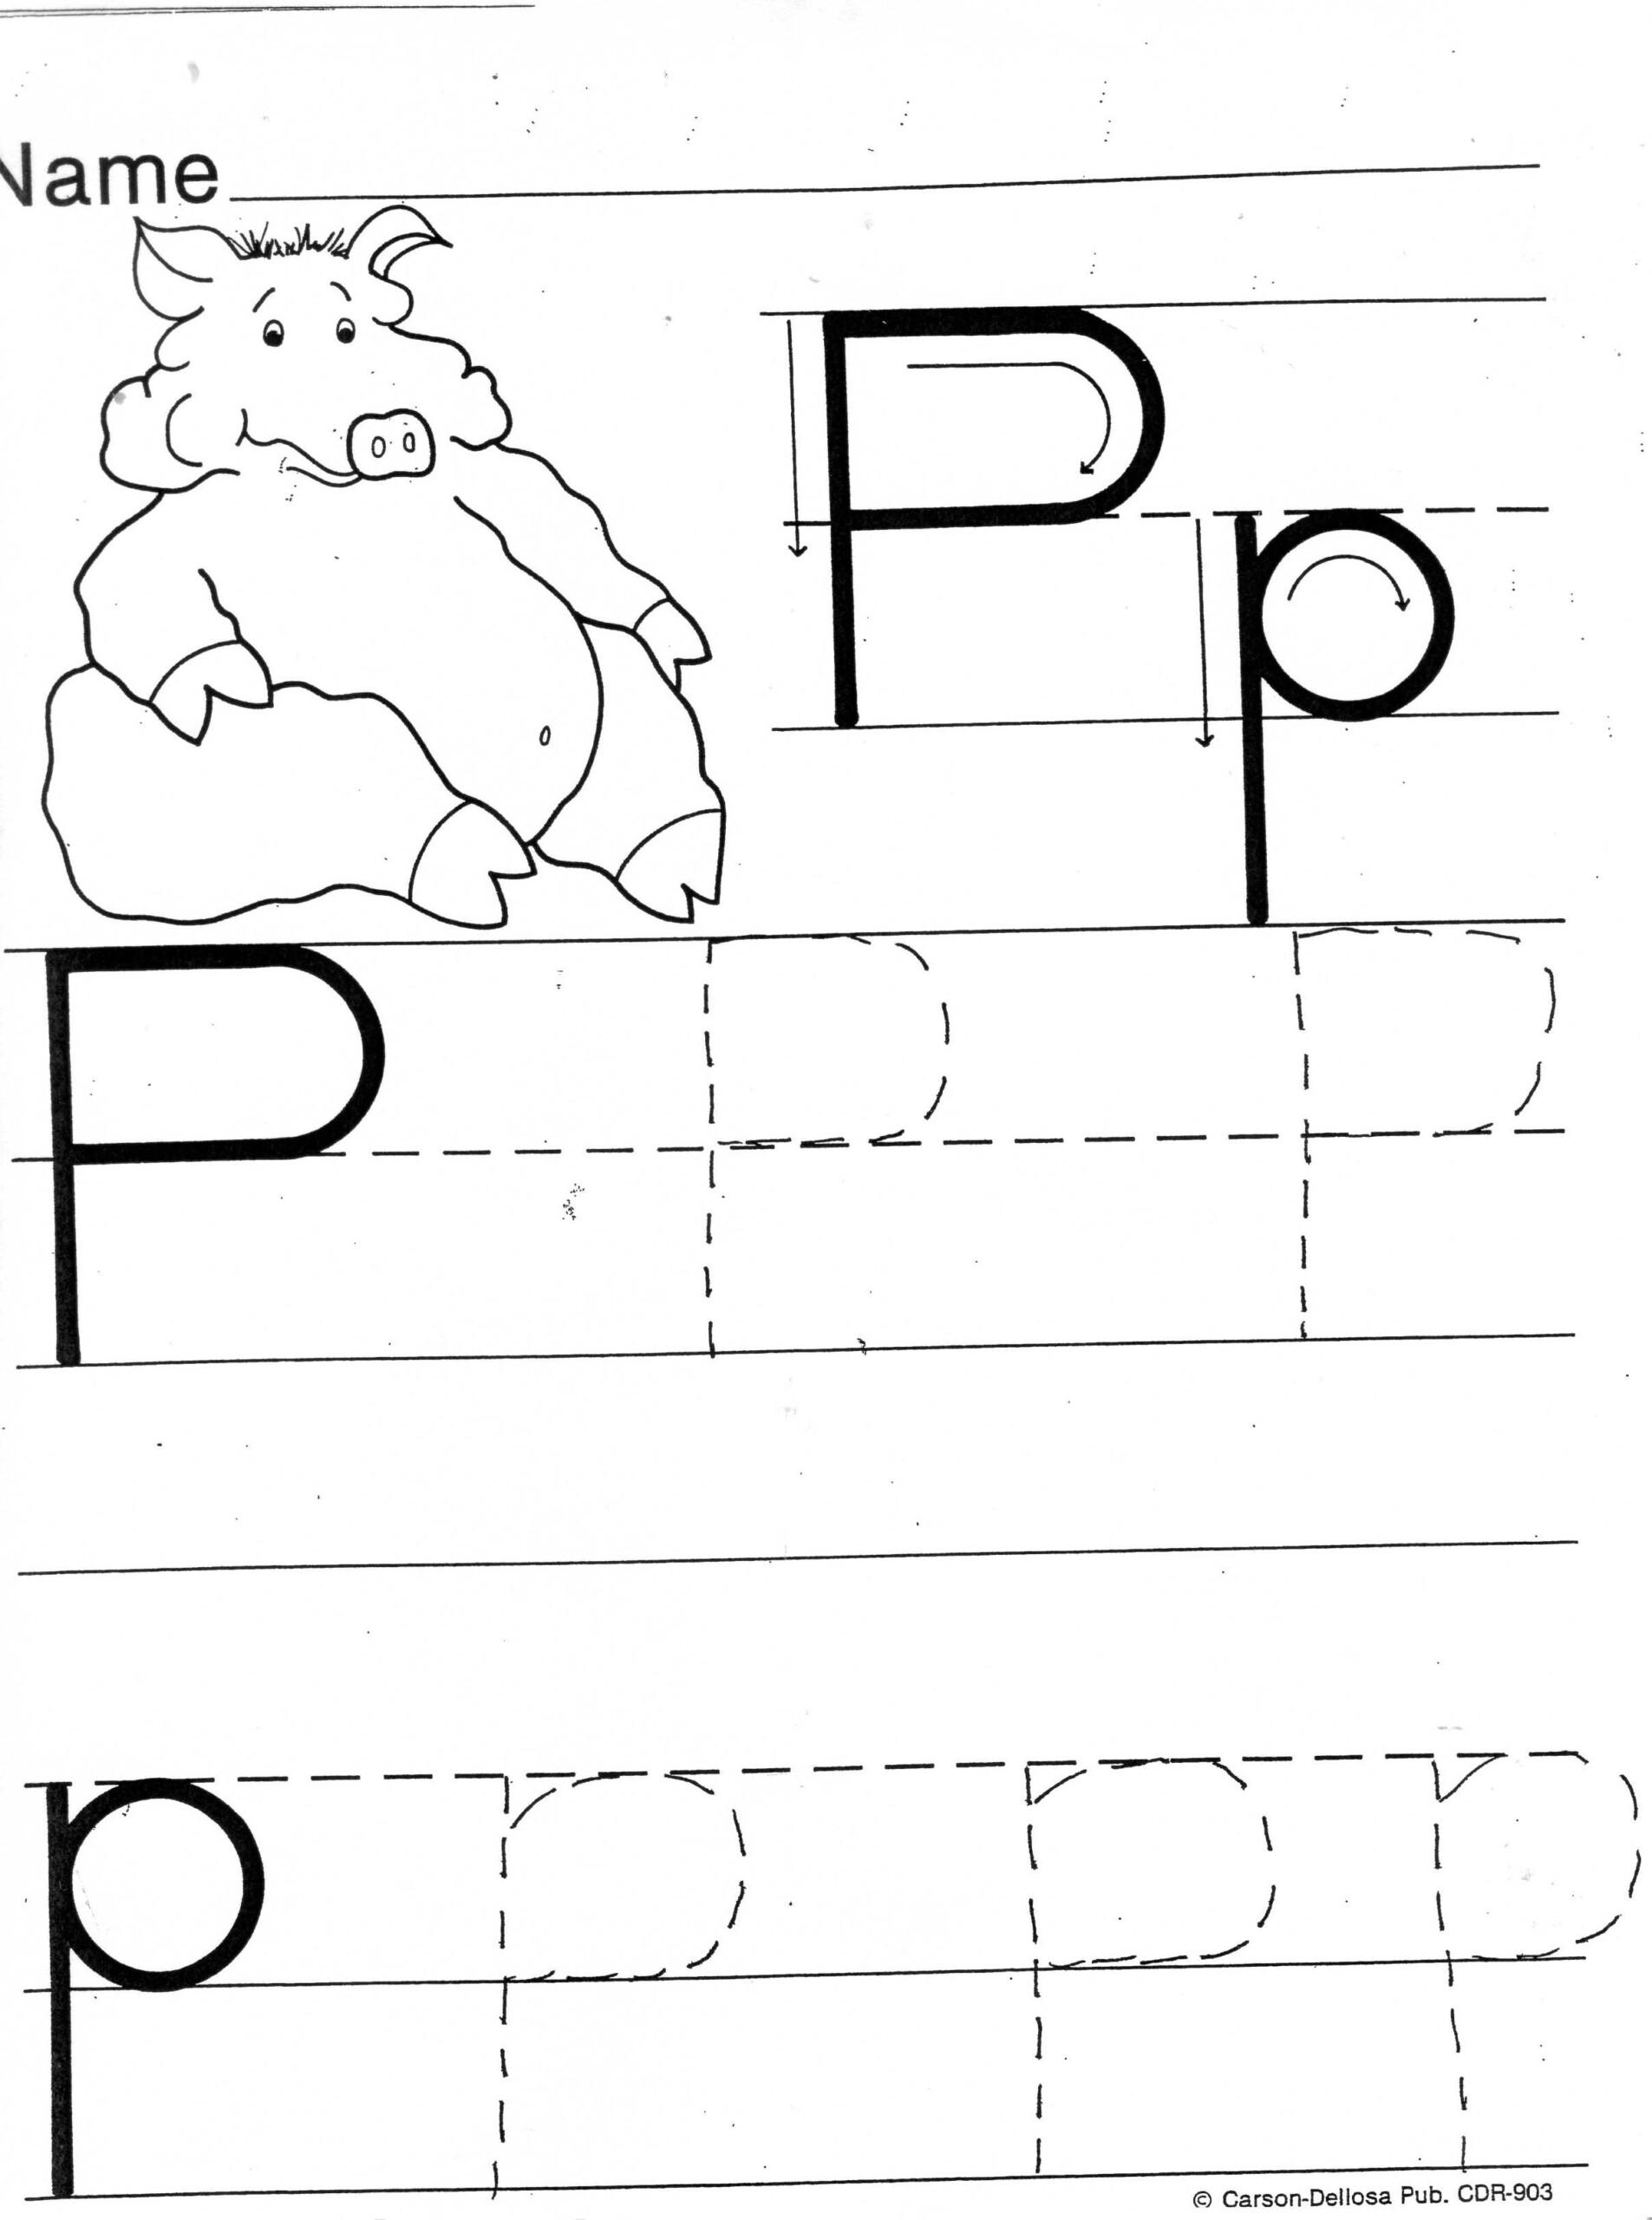 Letter P Handwriting Worksheet لم يسبق له مثيل الصور + Tier3.xyz